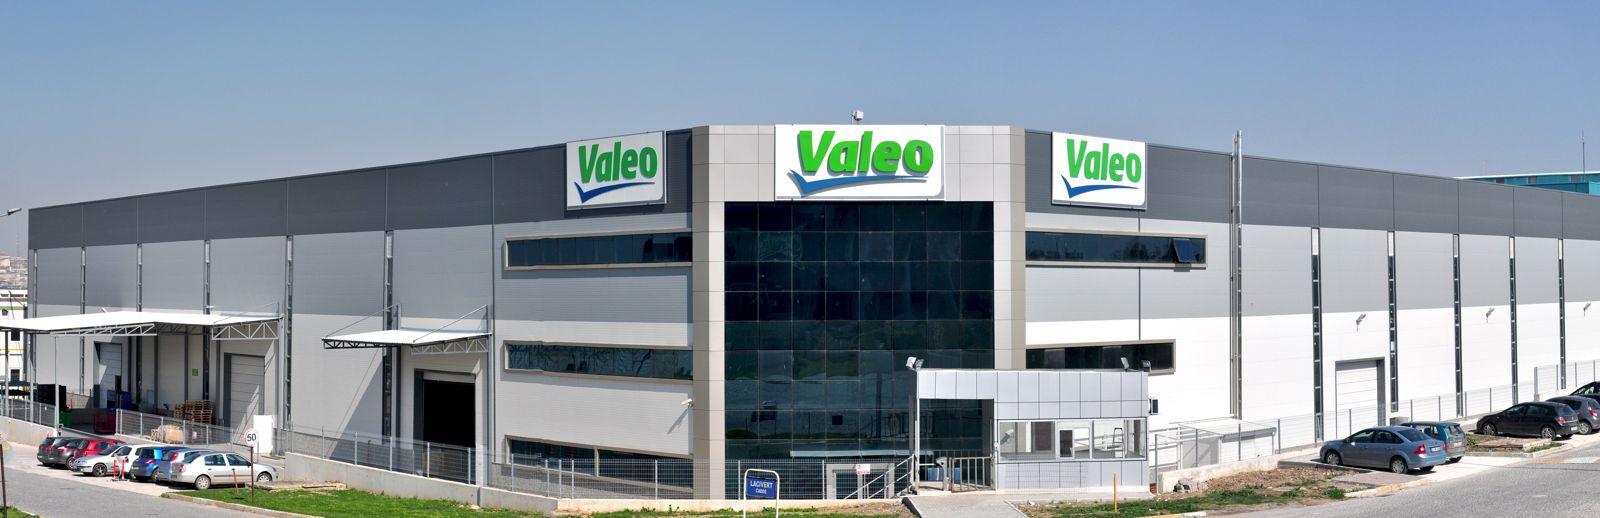 Valeo production plant in Bursa Turkey